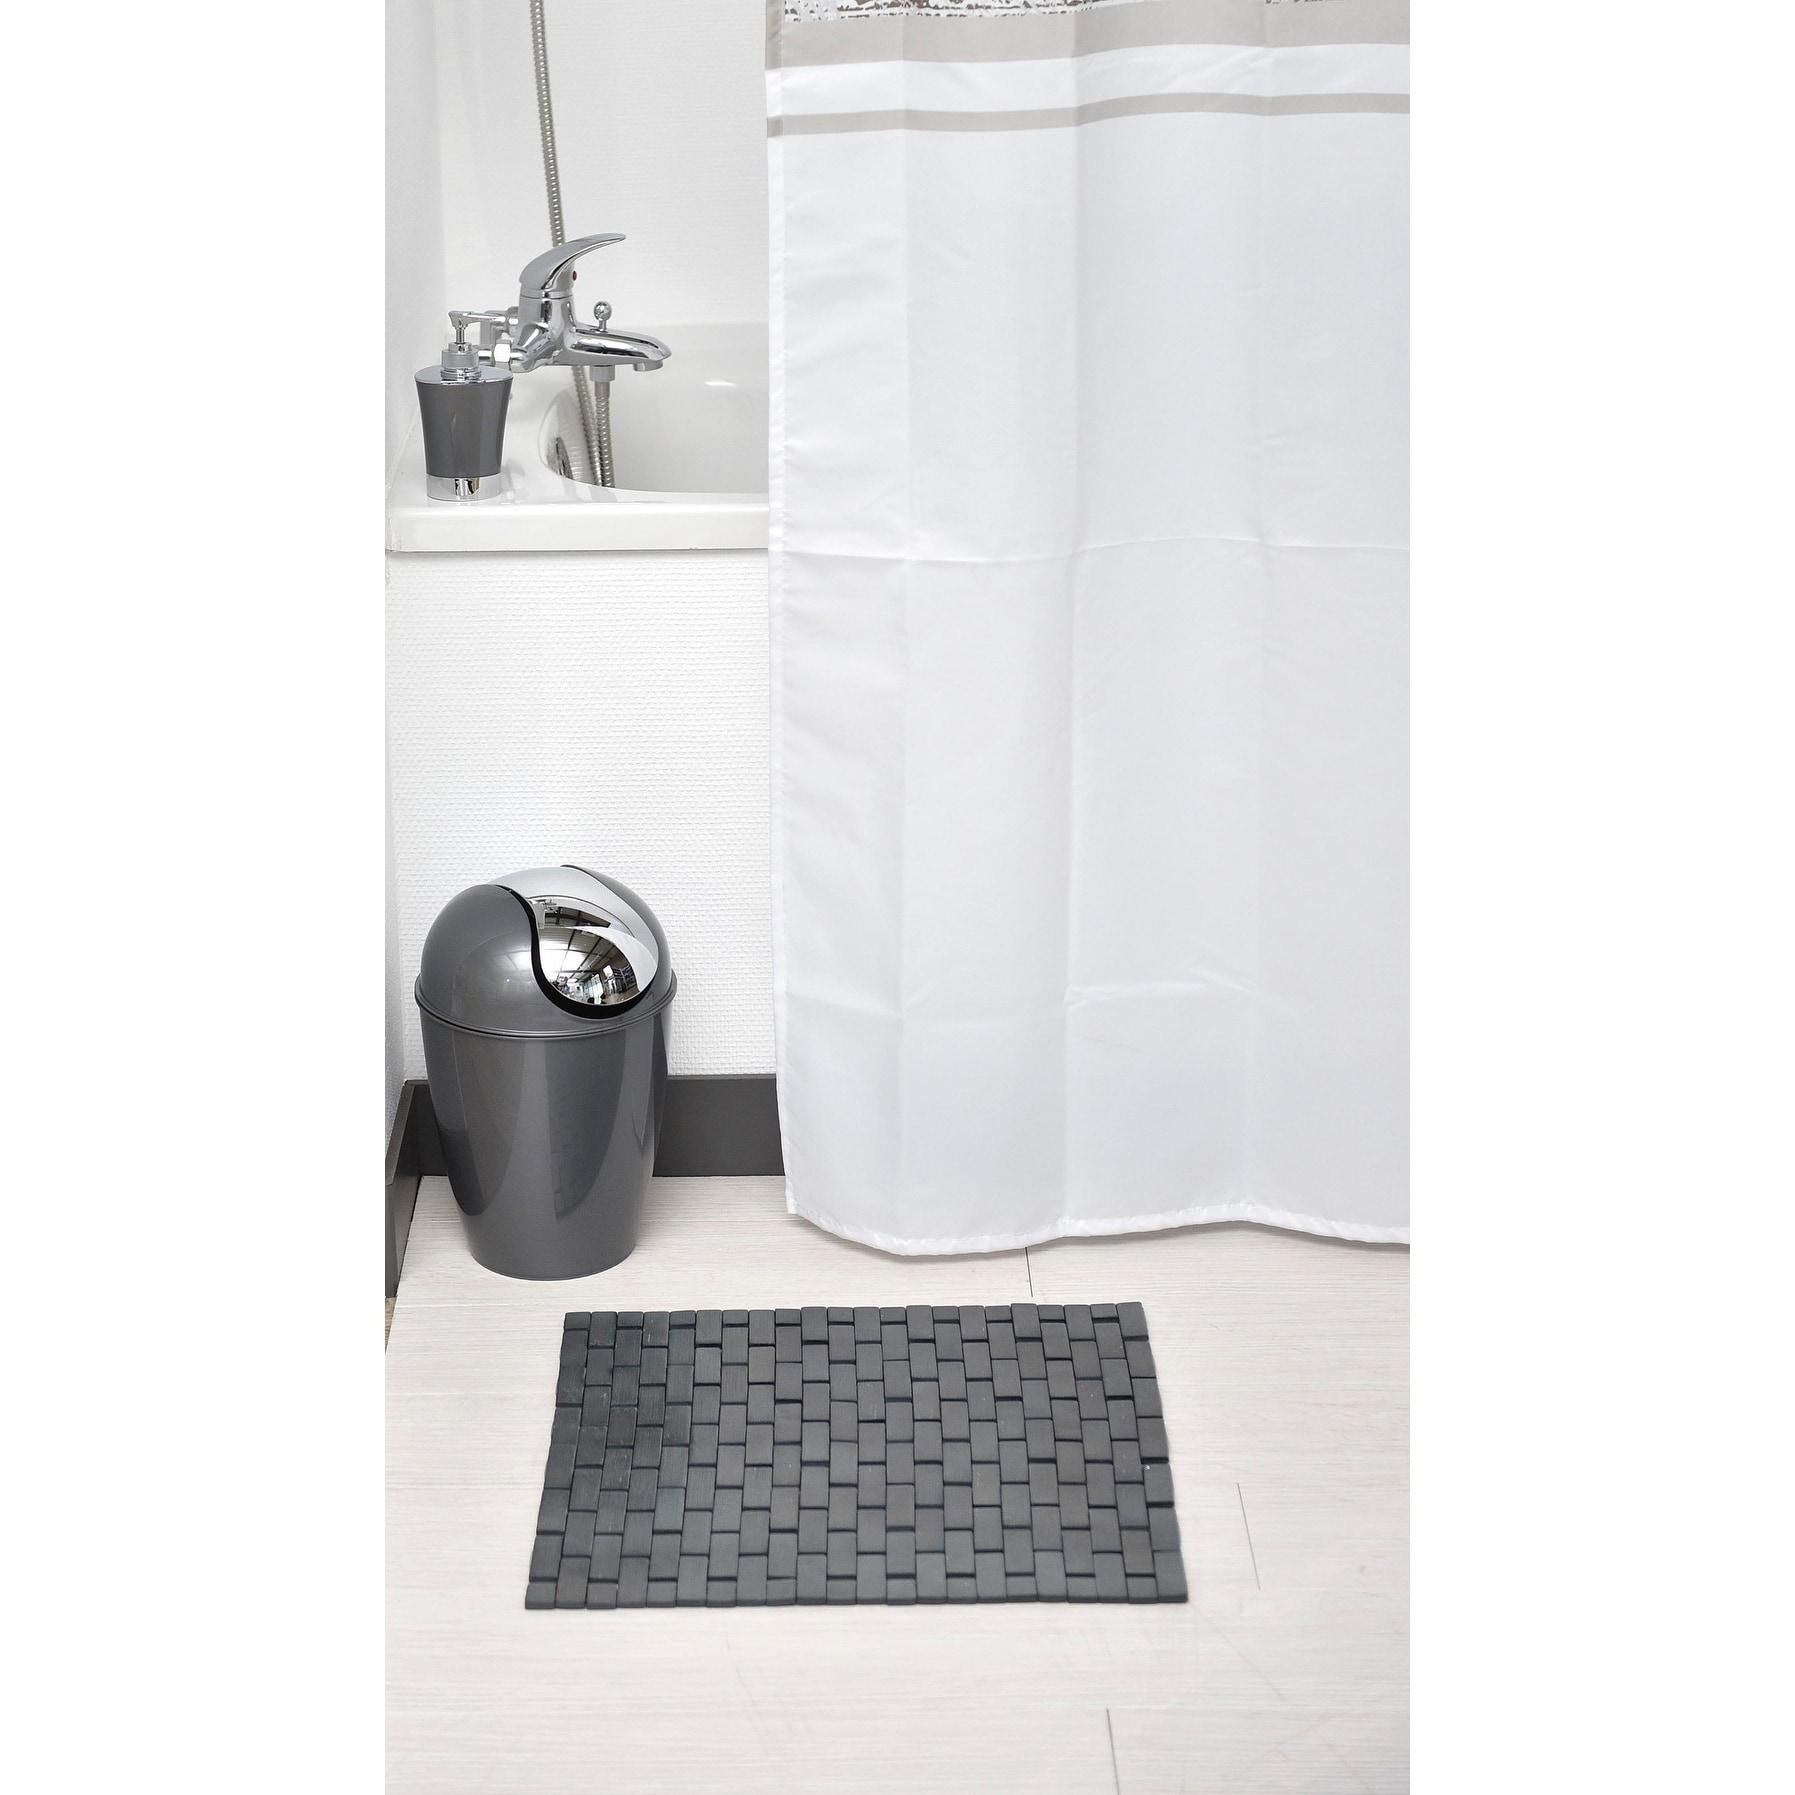 Shop Evideco Bamboo Slats Roll Up Foldable Shower Door Bath Mat